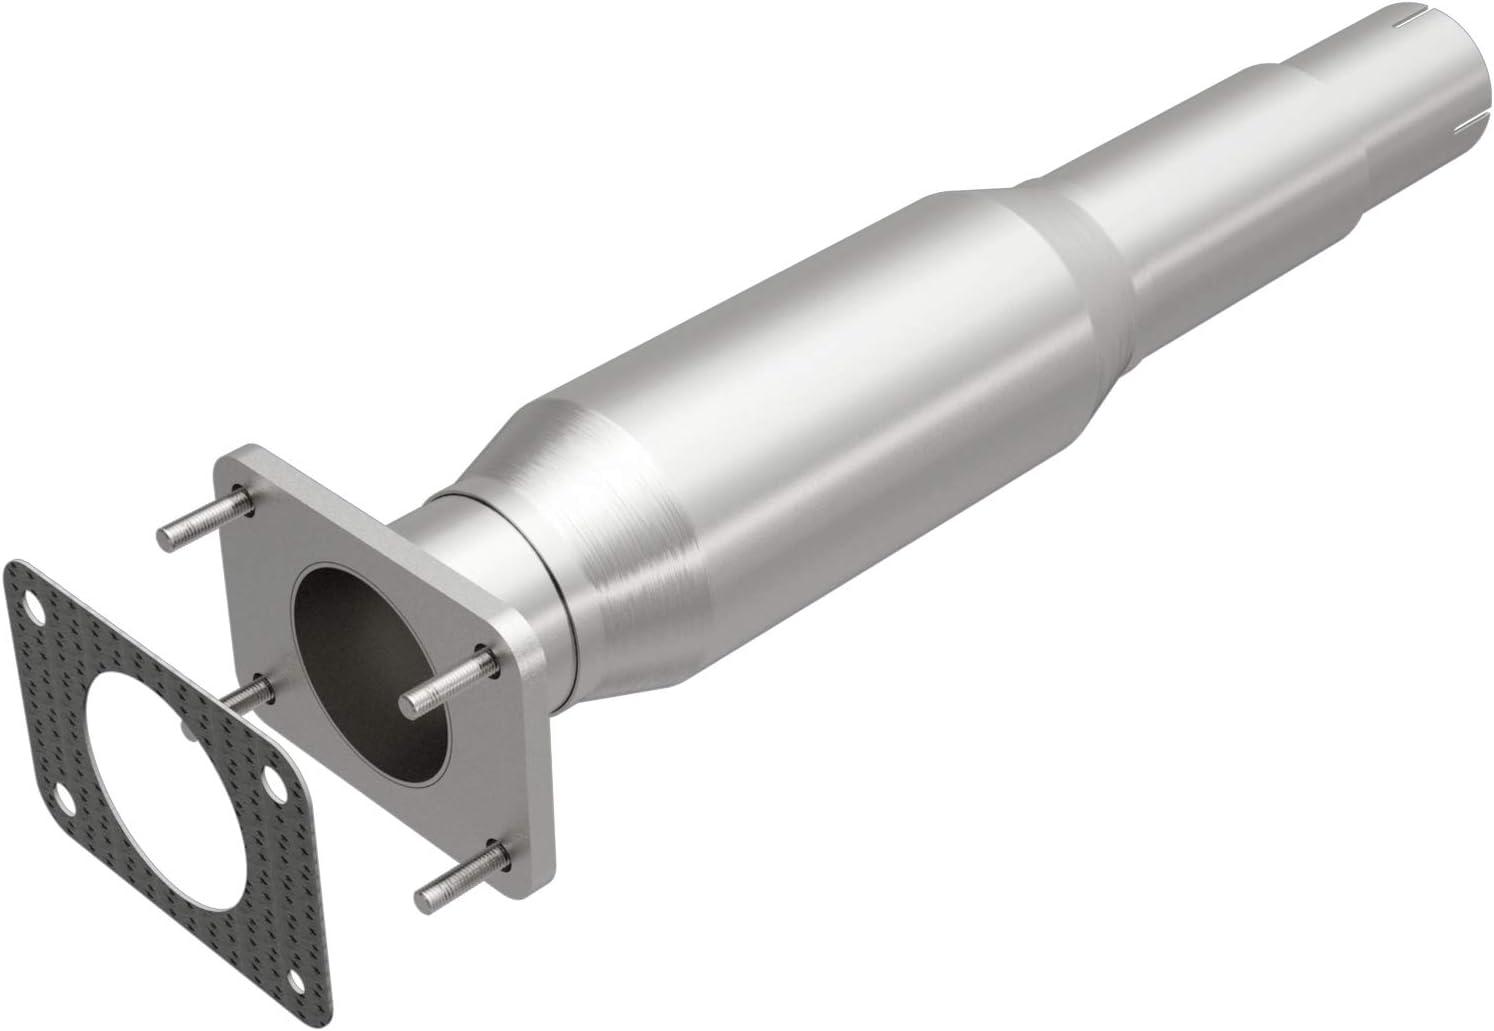 Non CARB compliant MagnaFlow 50803 Direct Fit Catalytic Converter